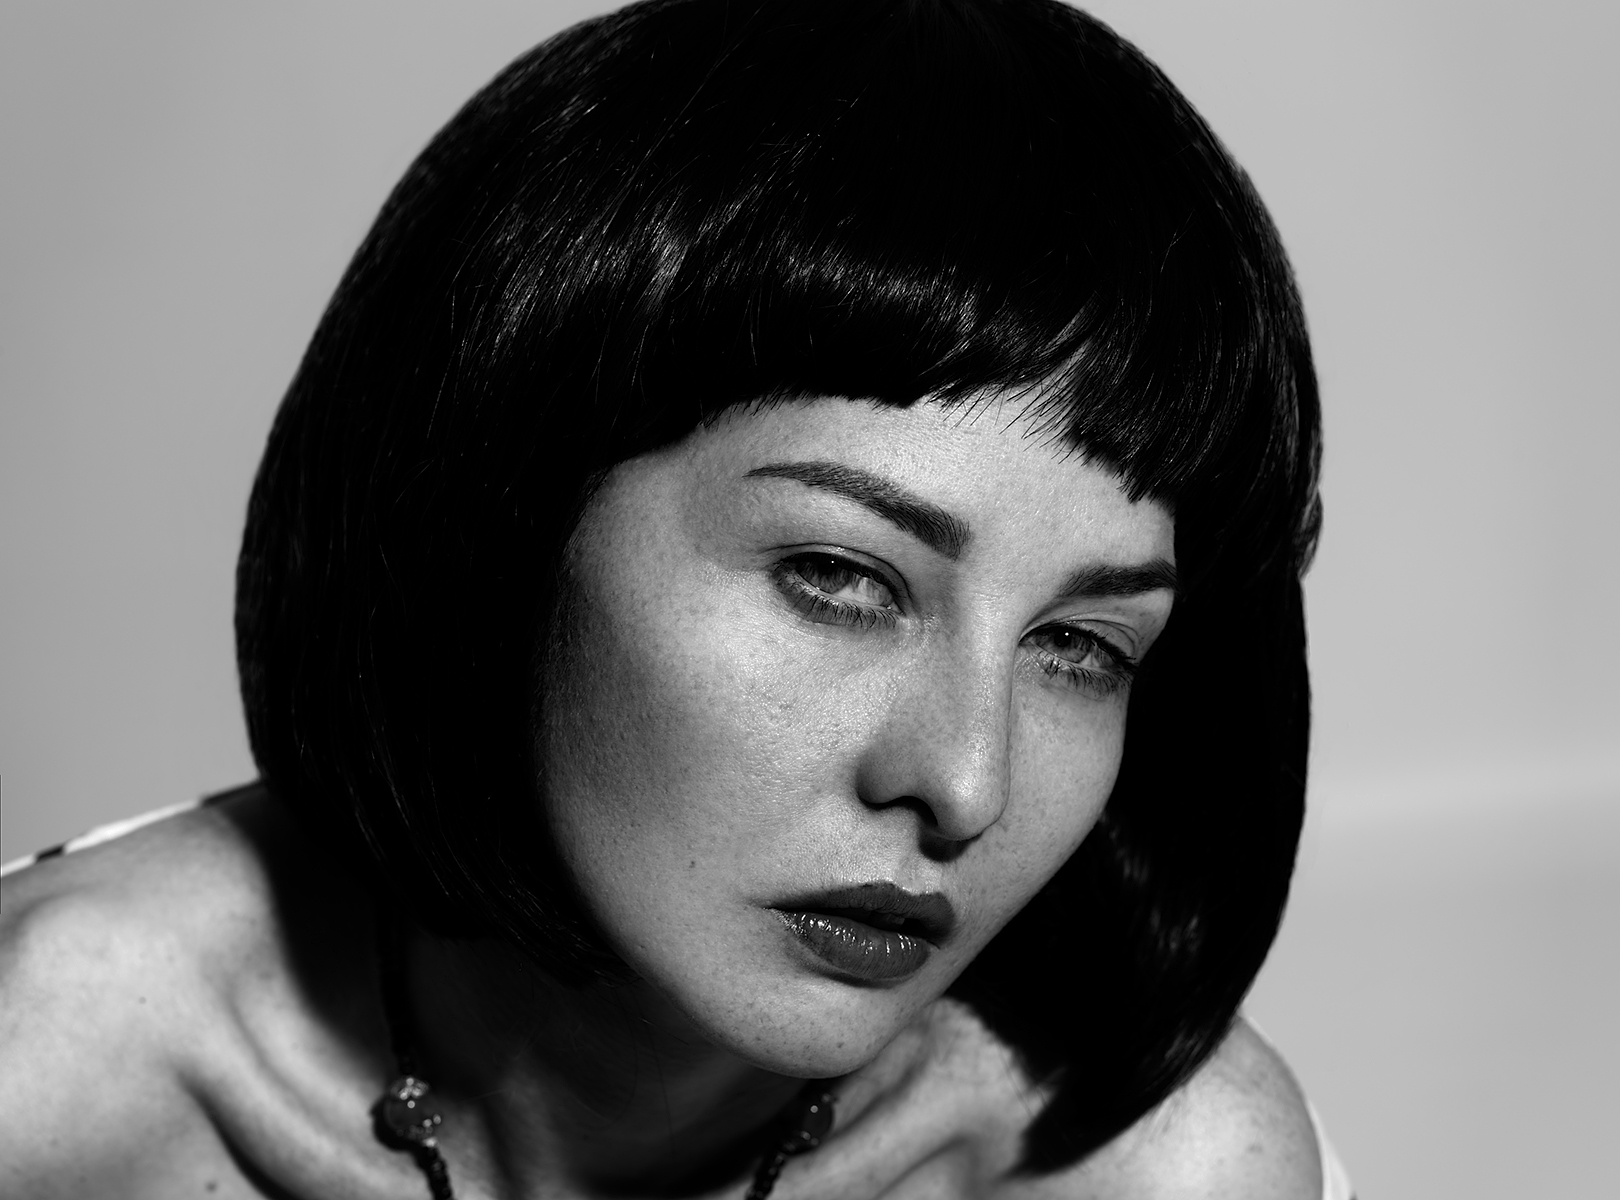 Model: EleonoraPhotographer: Gary McGillivray-BirnieLocation: Atyrau, Kazakhstan